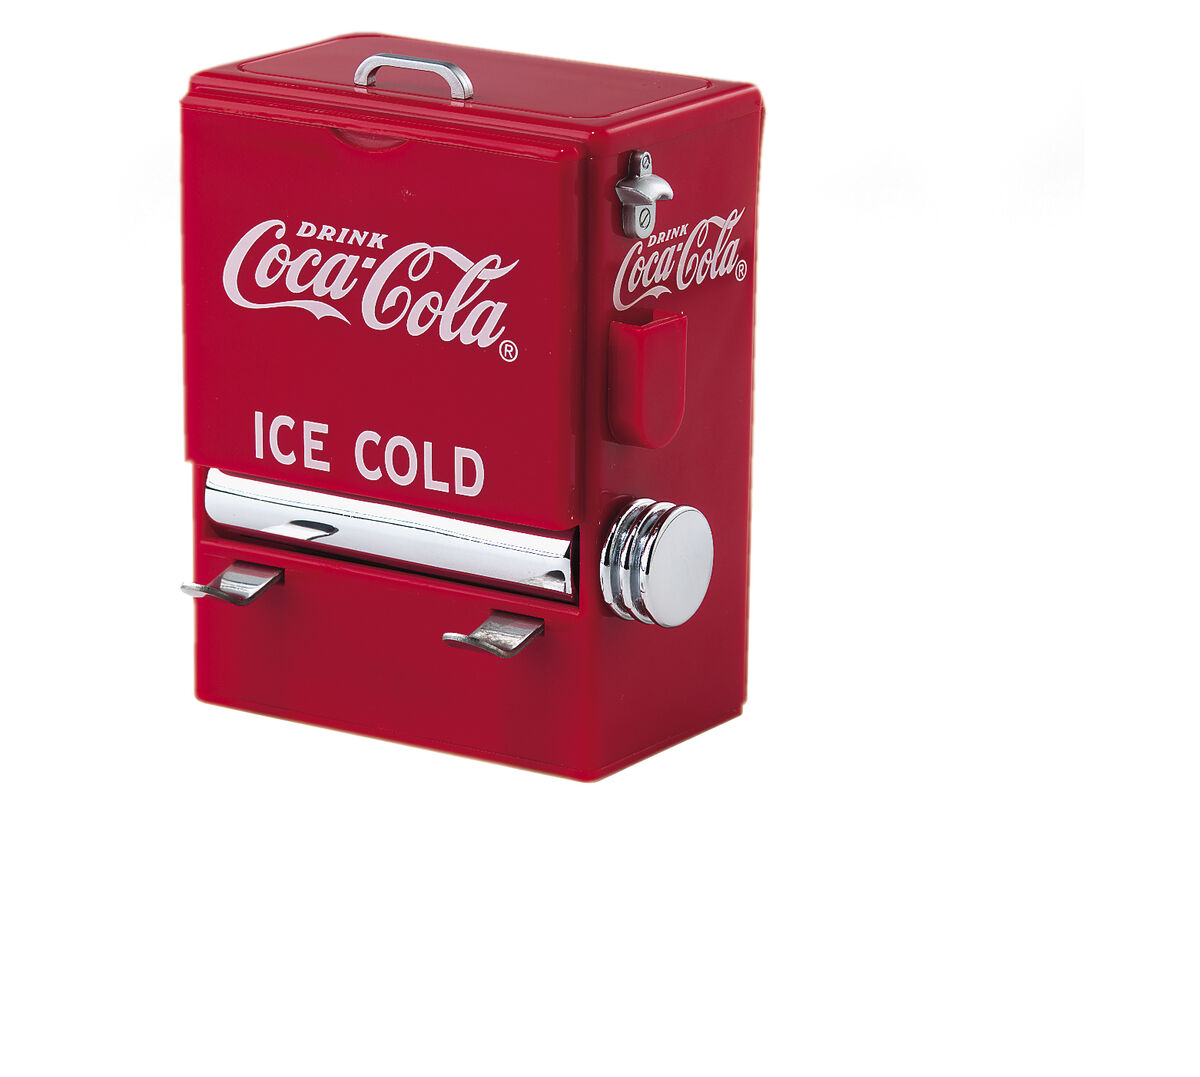 Coke coca cola toothpick dispenser coke machine - Pop up toothpick dispenser ...